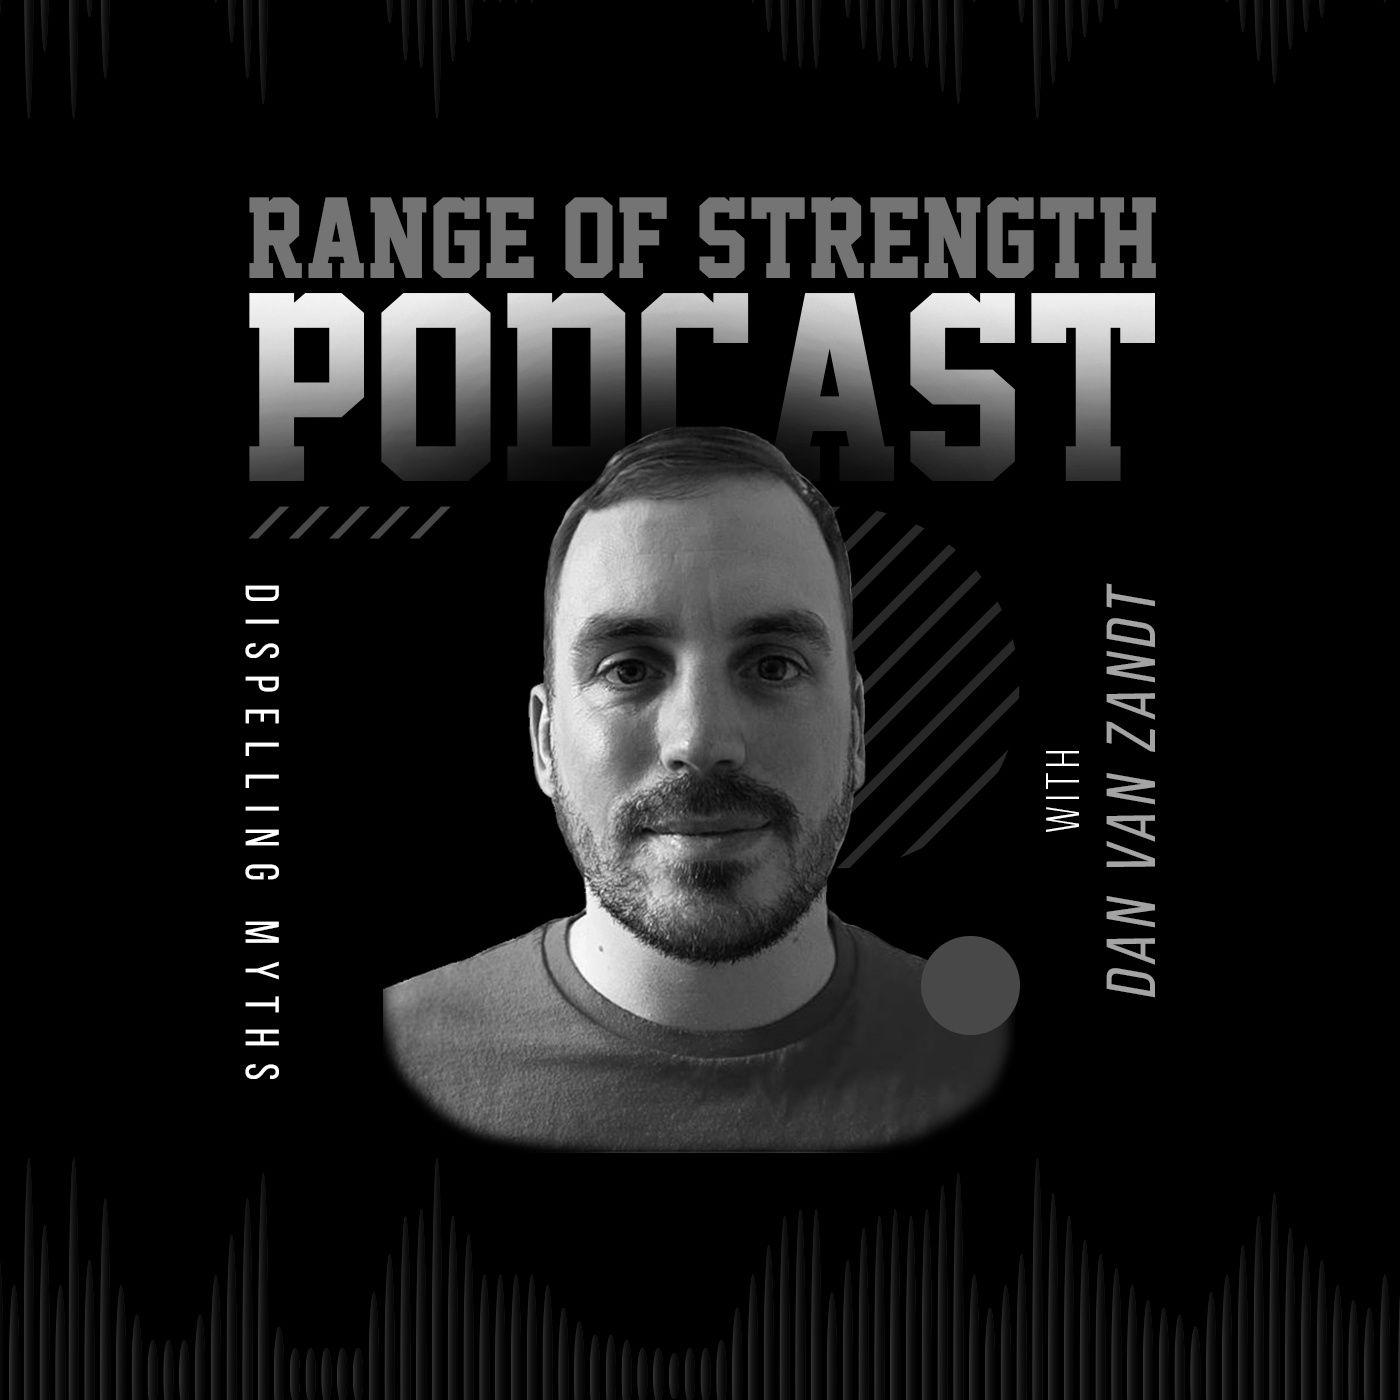 RANGE OF STRENGTH Podcast Episode 18: Dispelling Myths with Dan Van Zandt